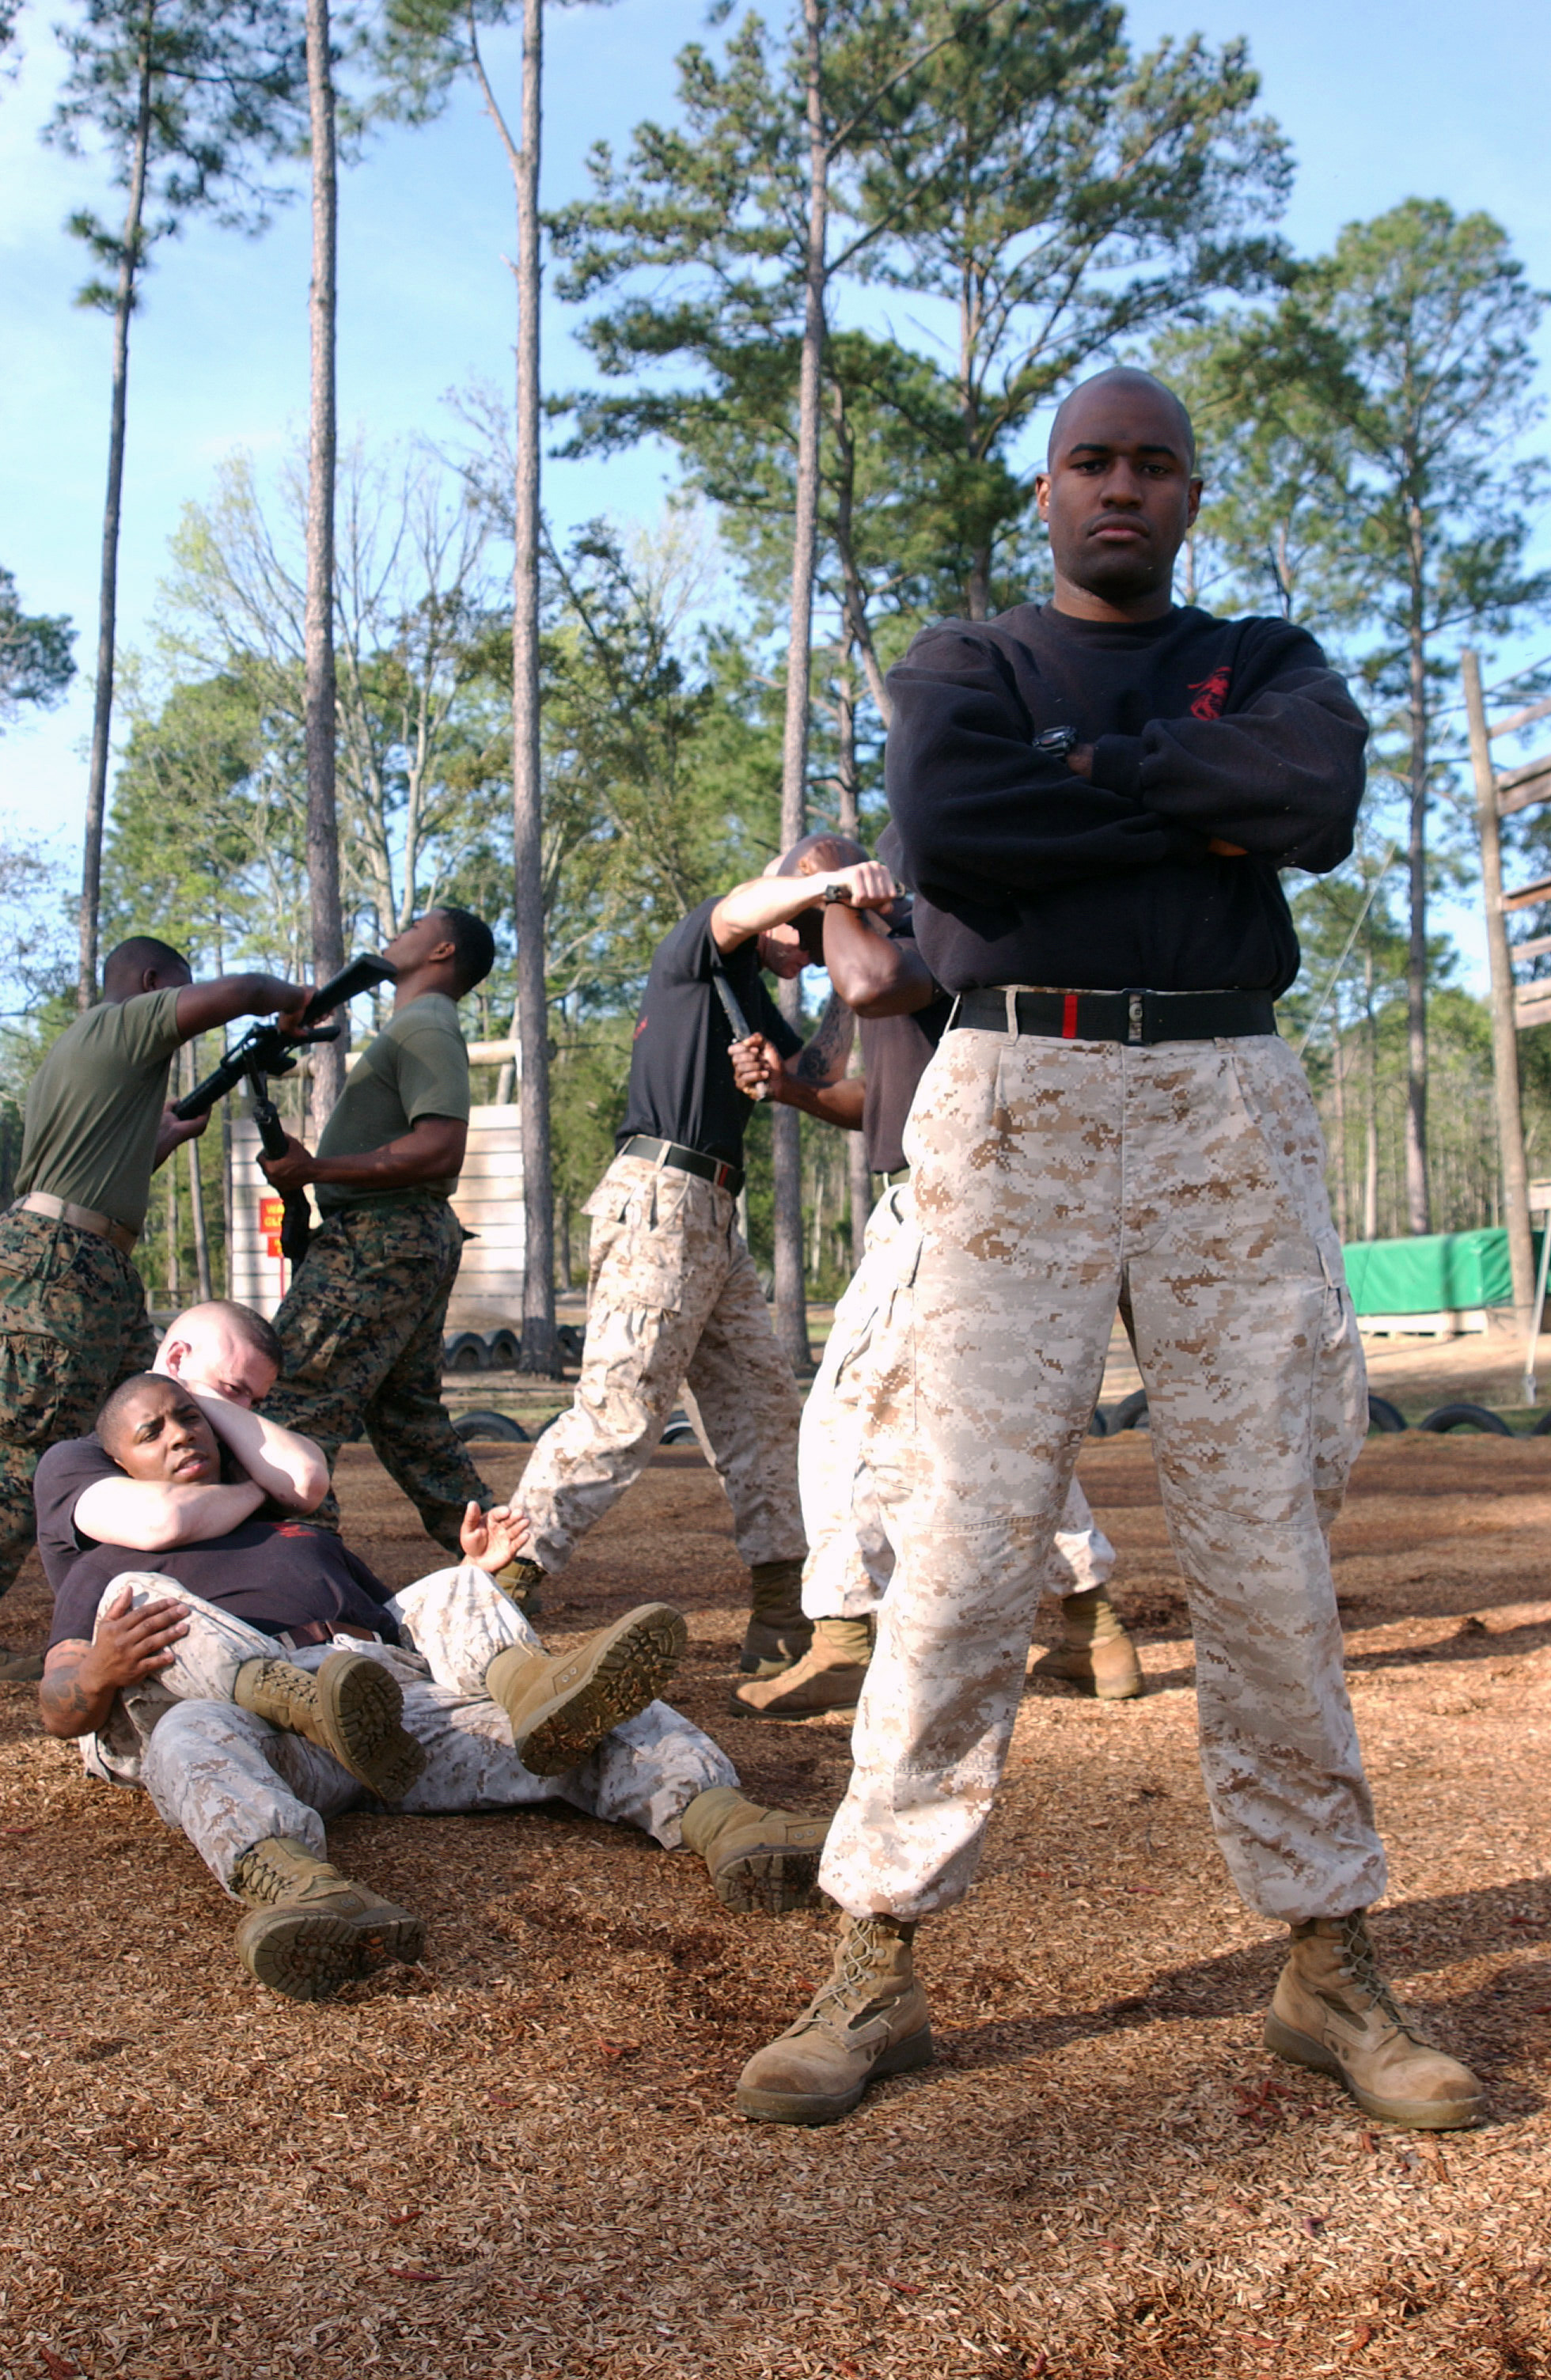 Marine Corps Martial Arts Program - Wikimedia Commons